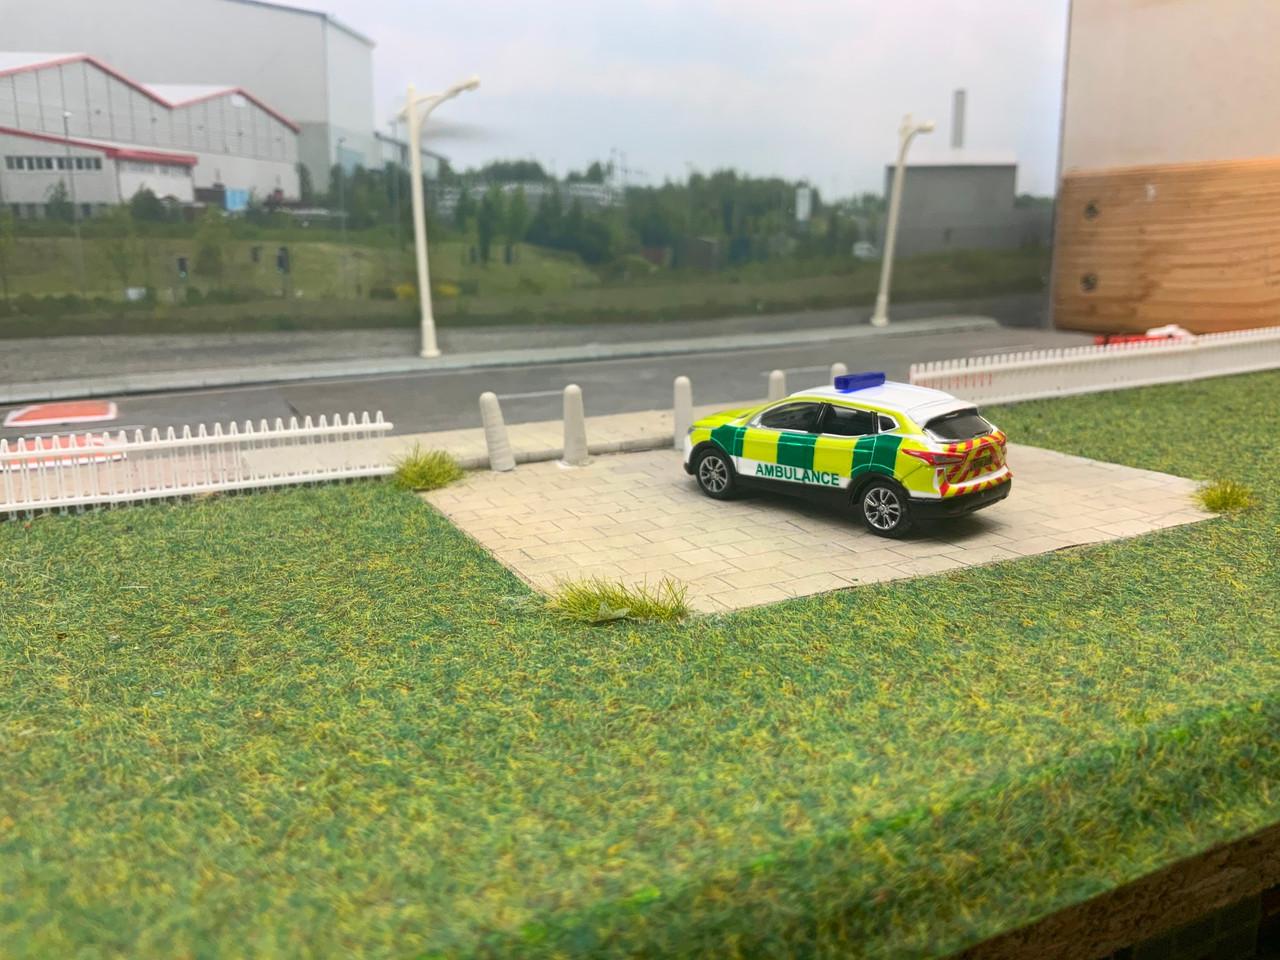 1:76 Code 3 Nissan Quashqai Ambulance rapid response (White)